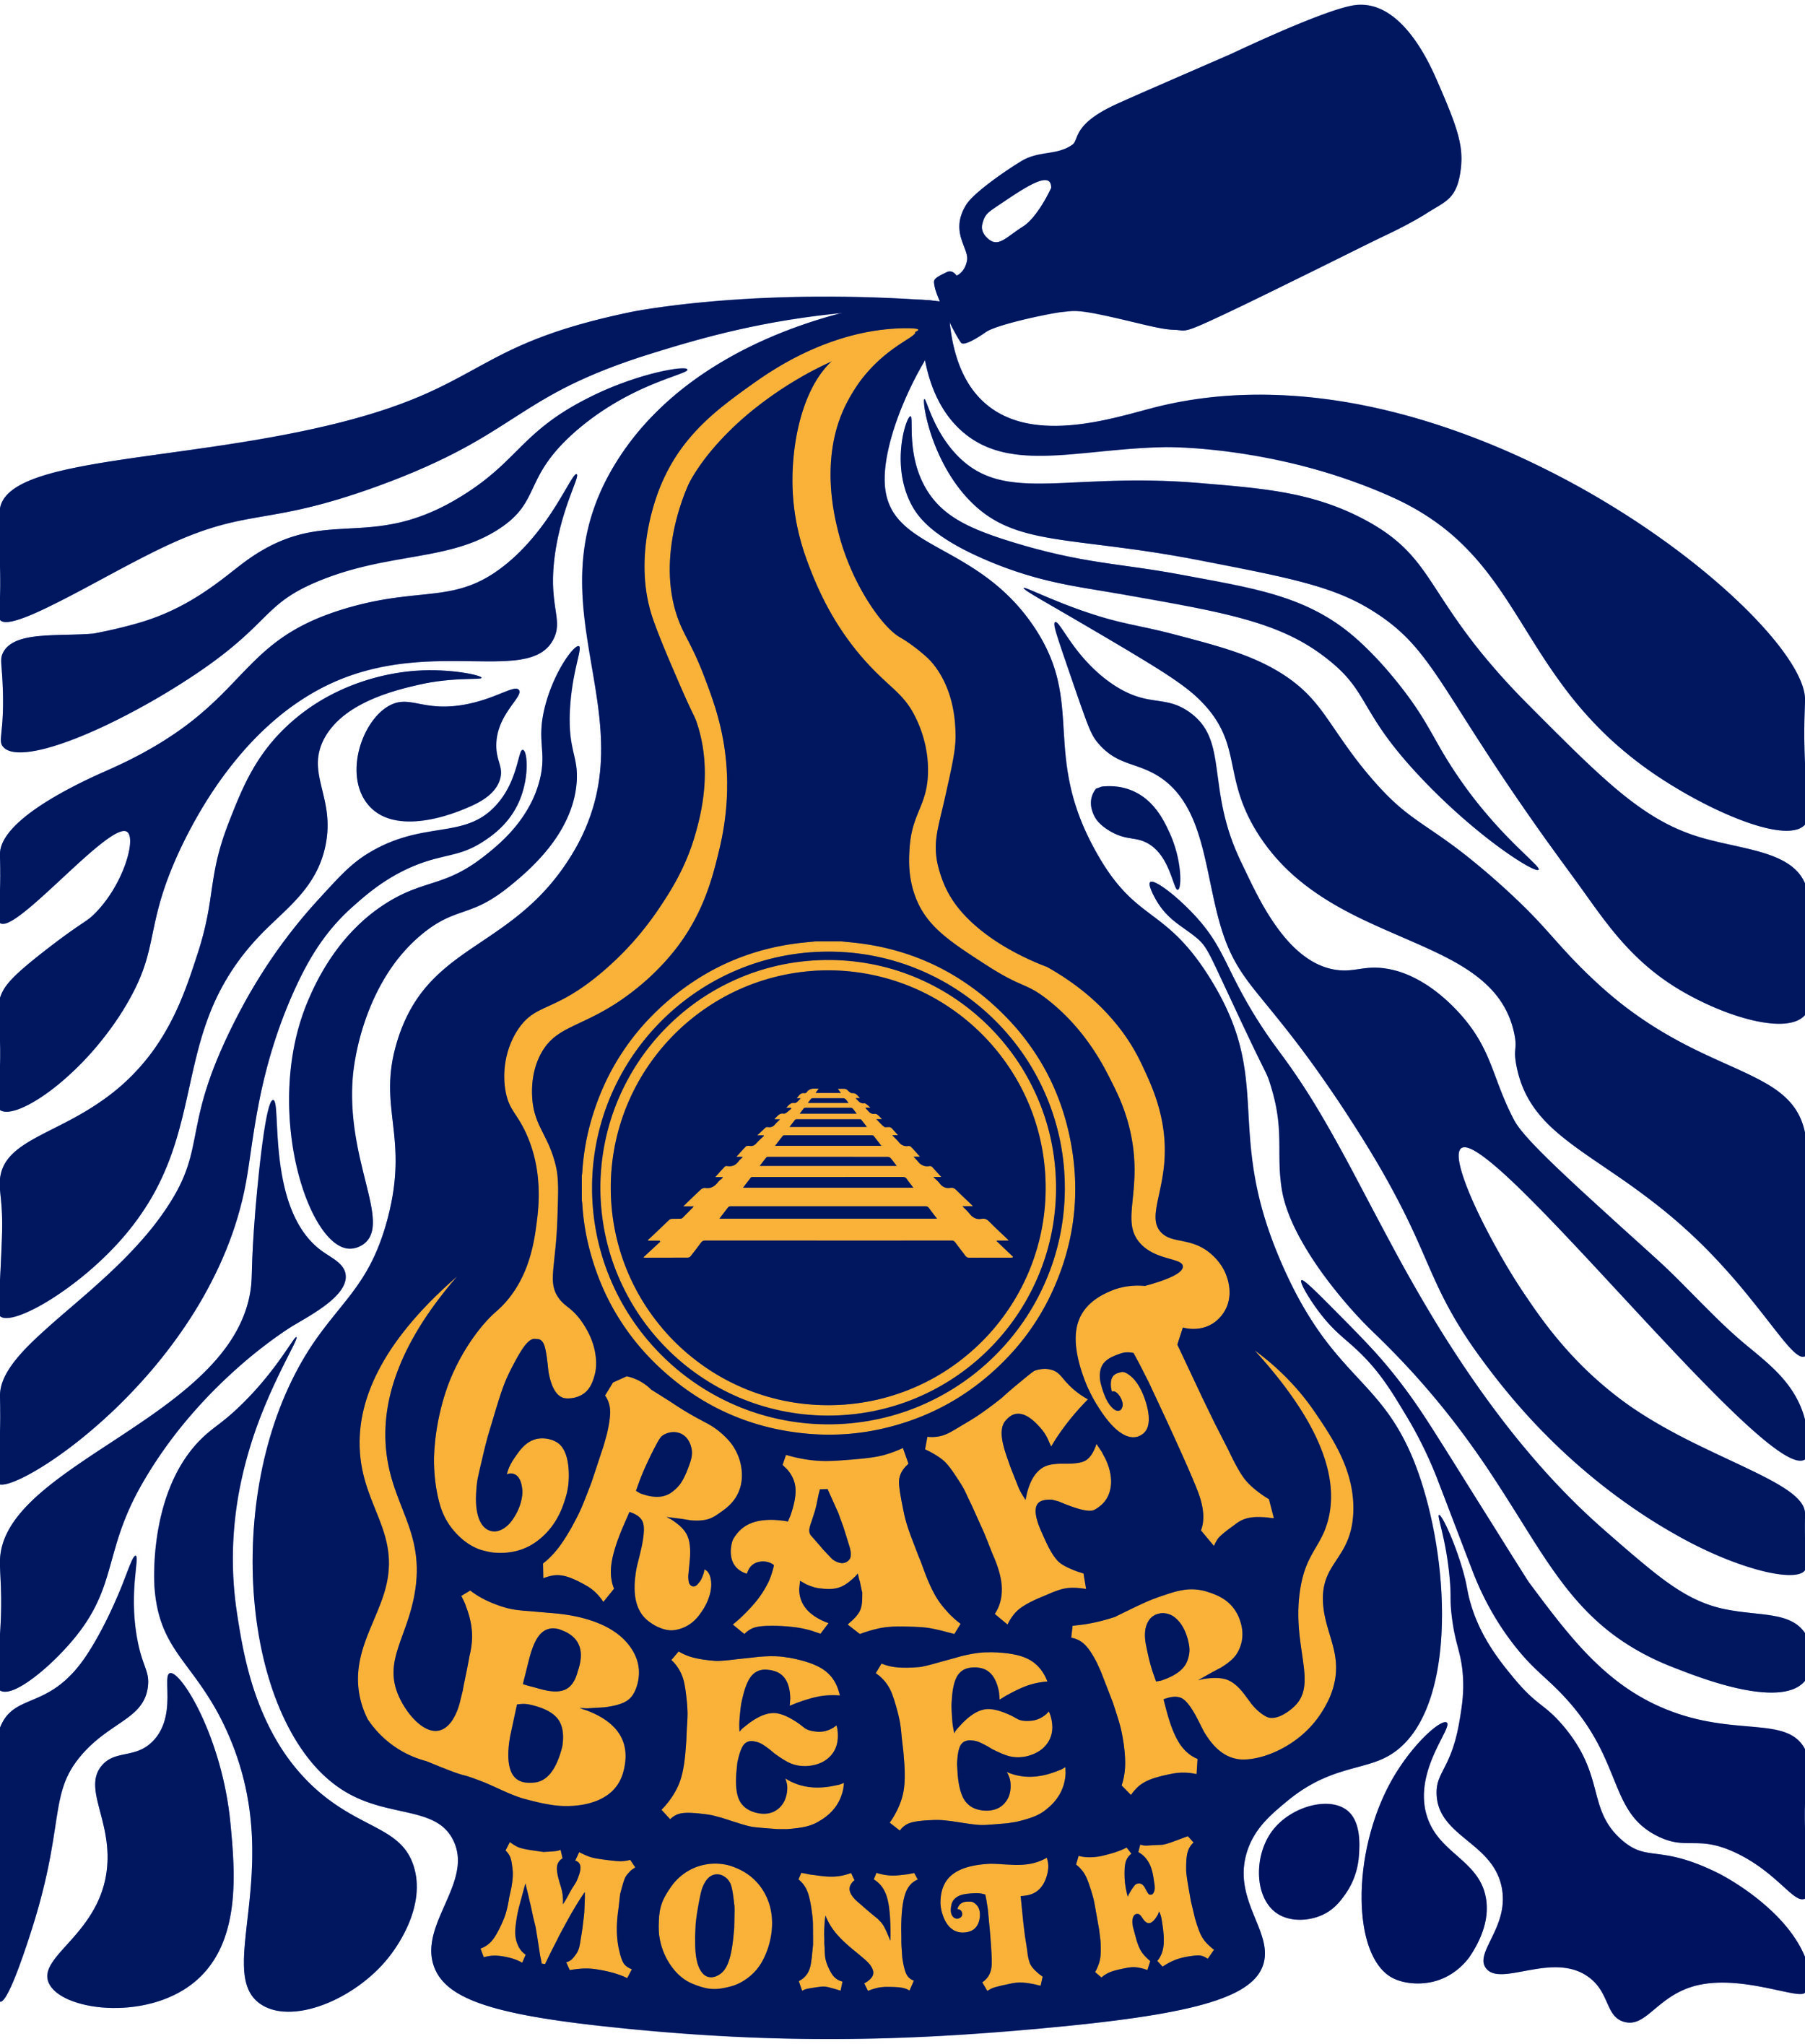 craft beer month.jpg